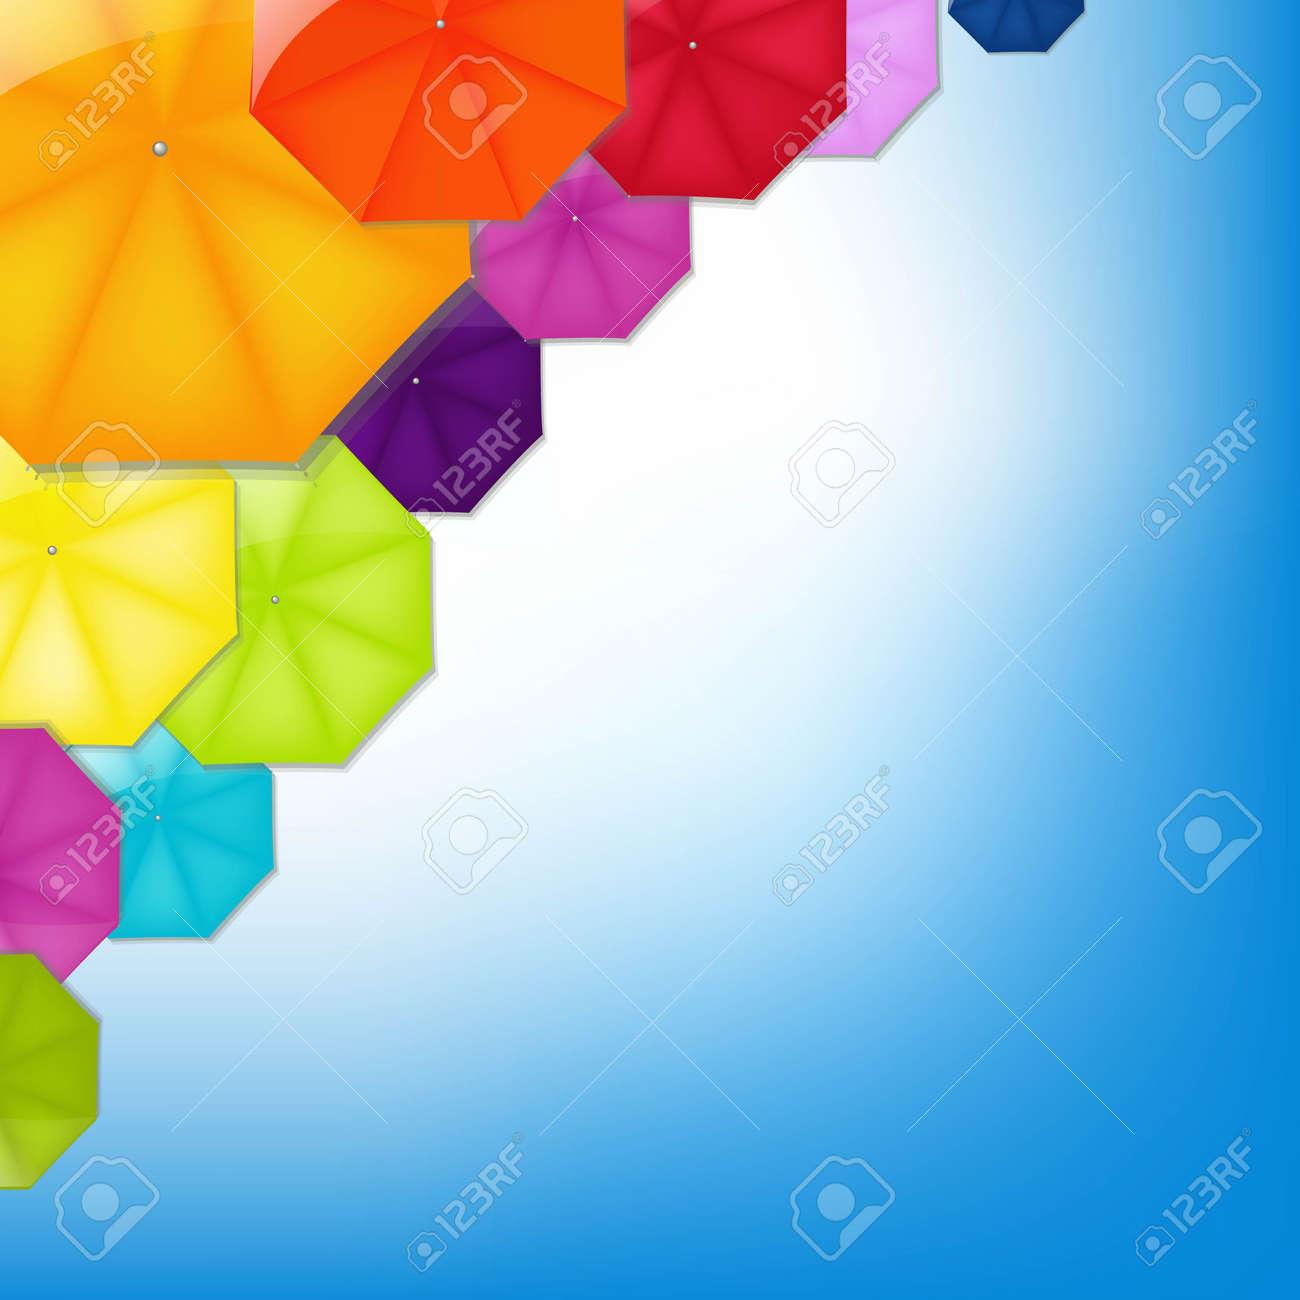 Color Umbrellas With Gradient Mesh, Vector Illustration - 21902869